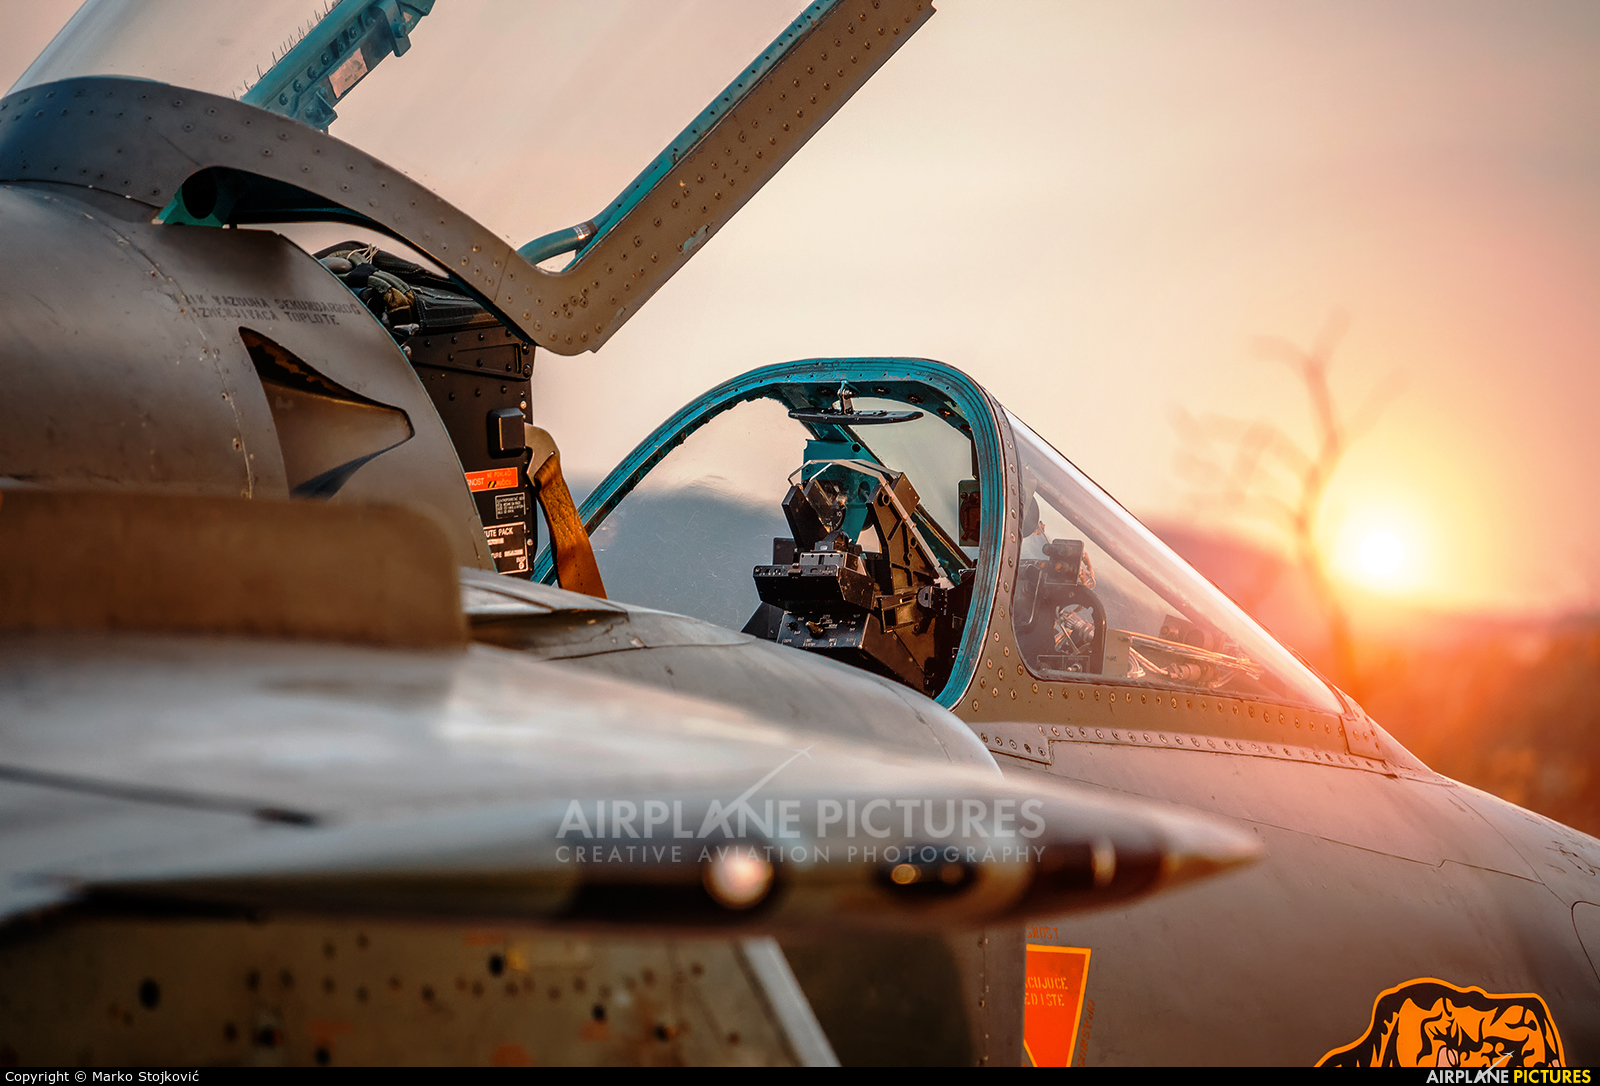 Serbia - Air Force 25154 aircraft at Nis - Konstantin Veliki